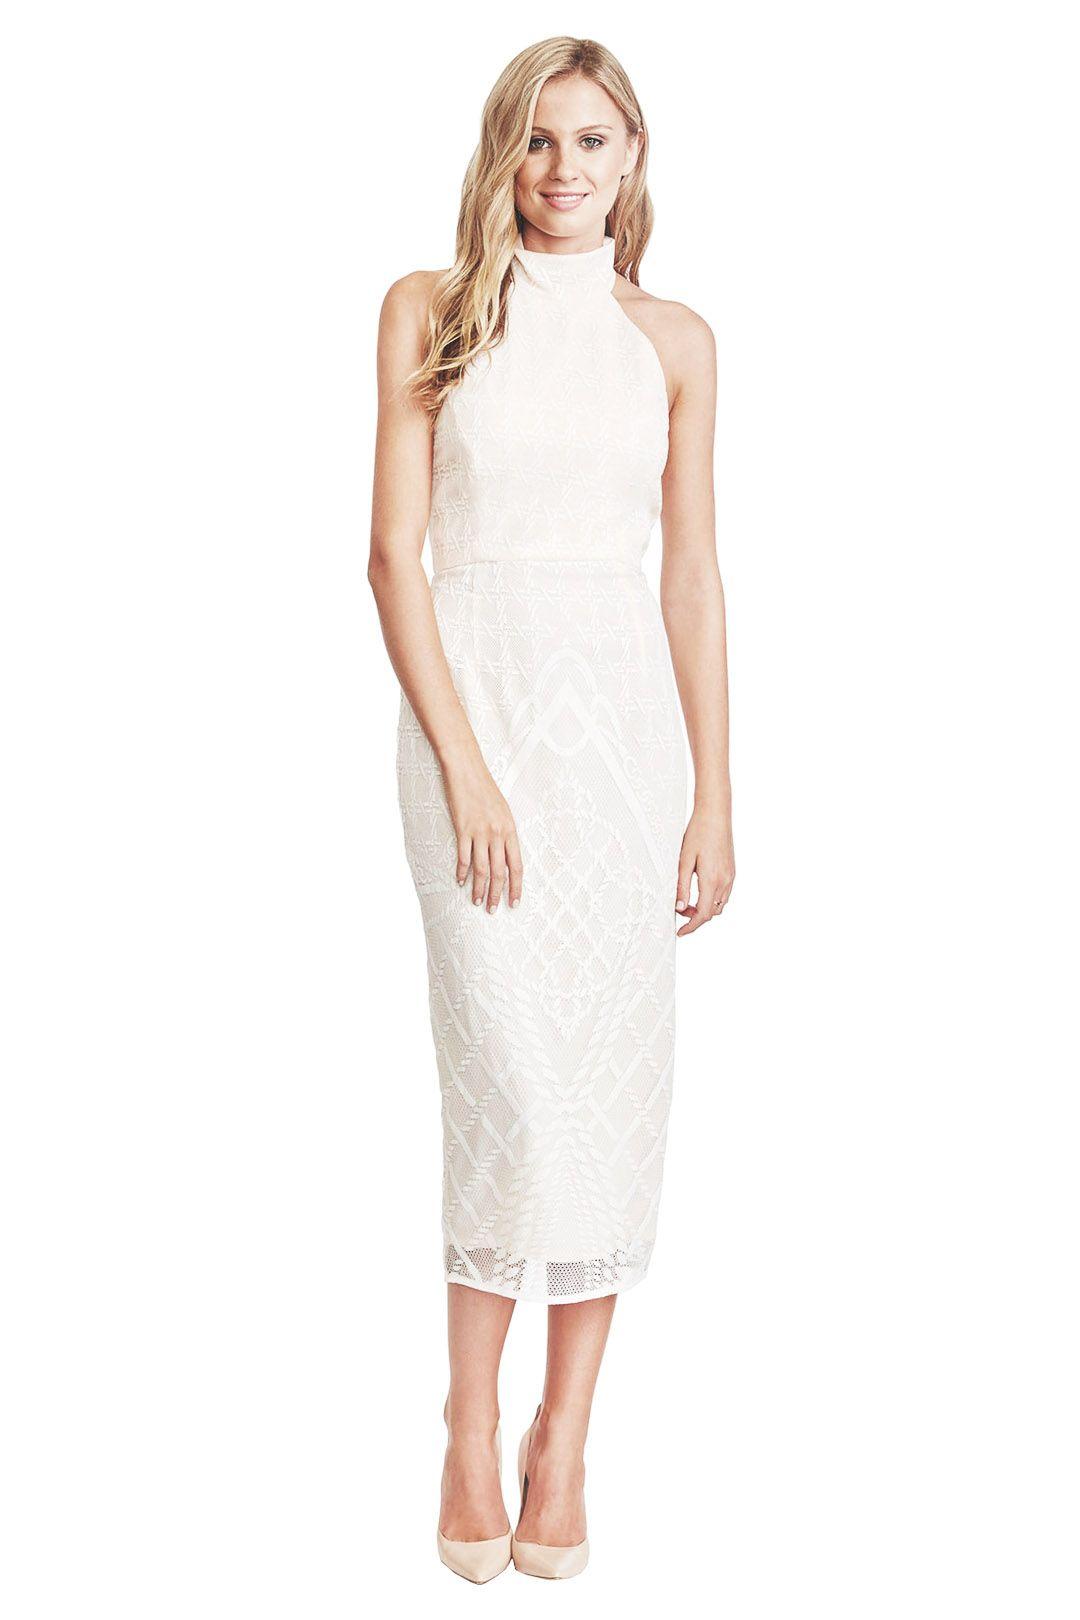 Shona Joy - Maddalena High Neck Midi Dress - Front - Ivory